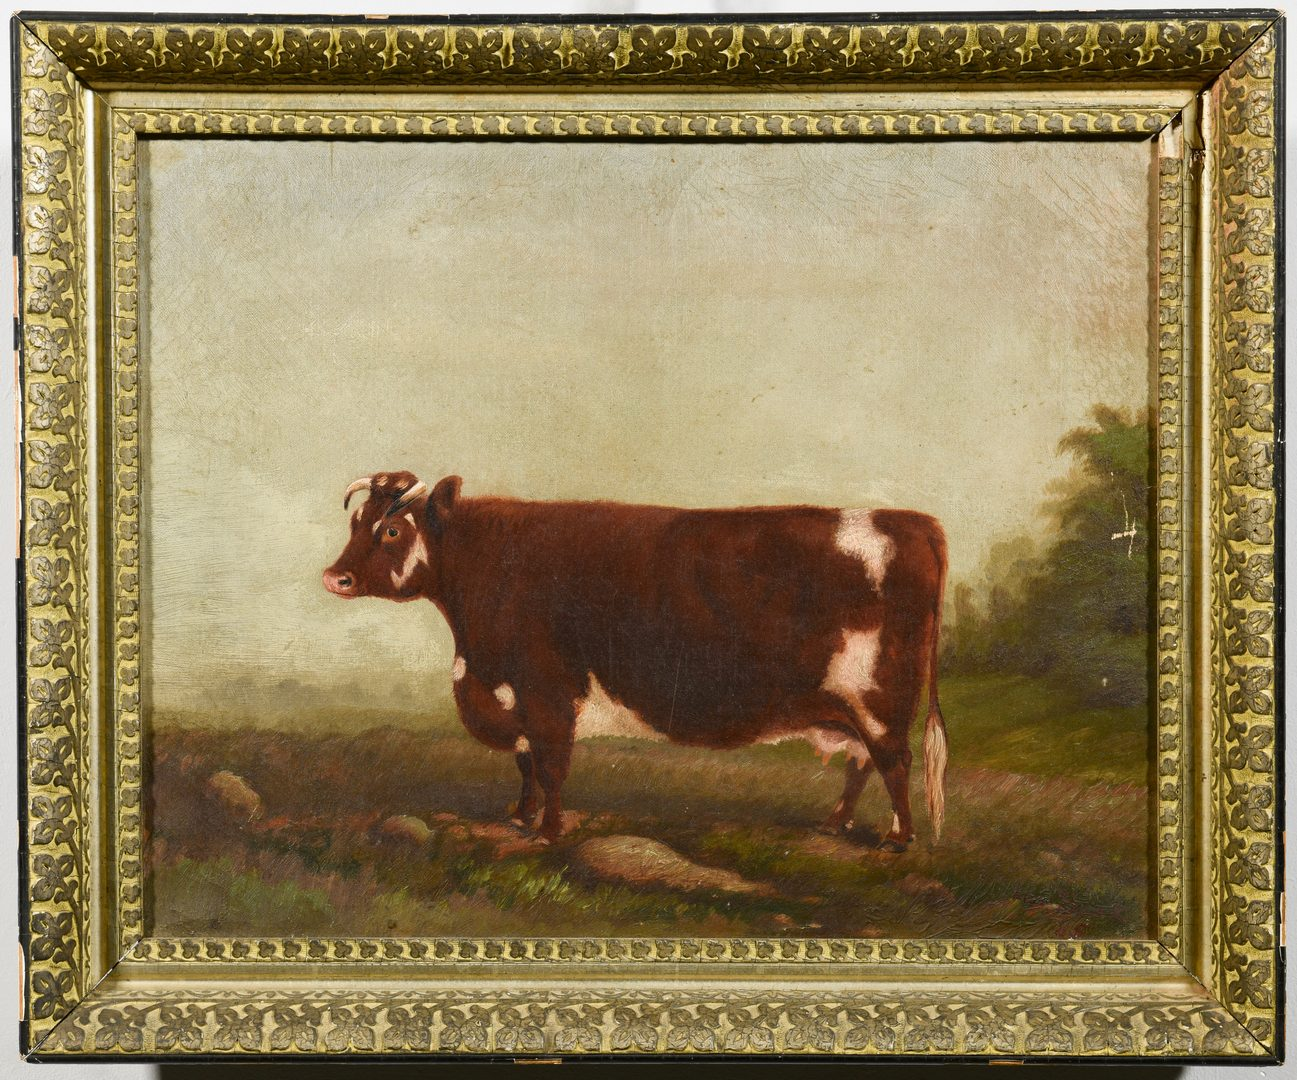 Lot 219: 19th c. Portrait of a Prize Cow, Devon Farm